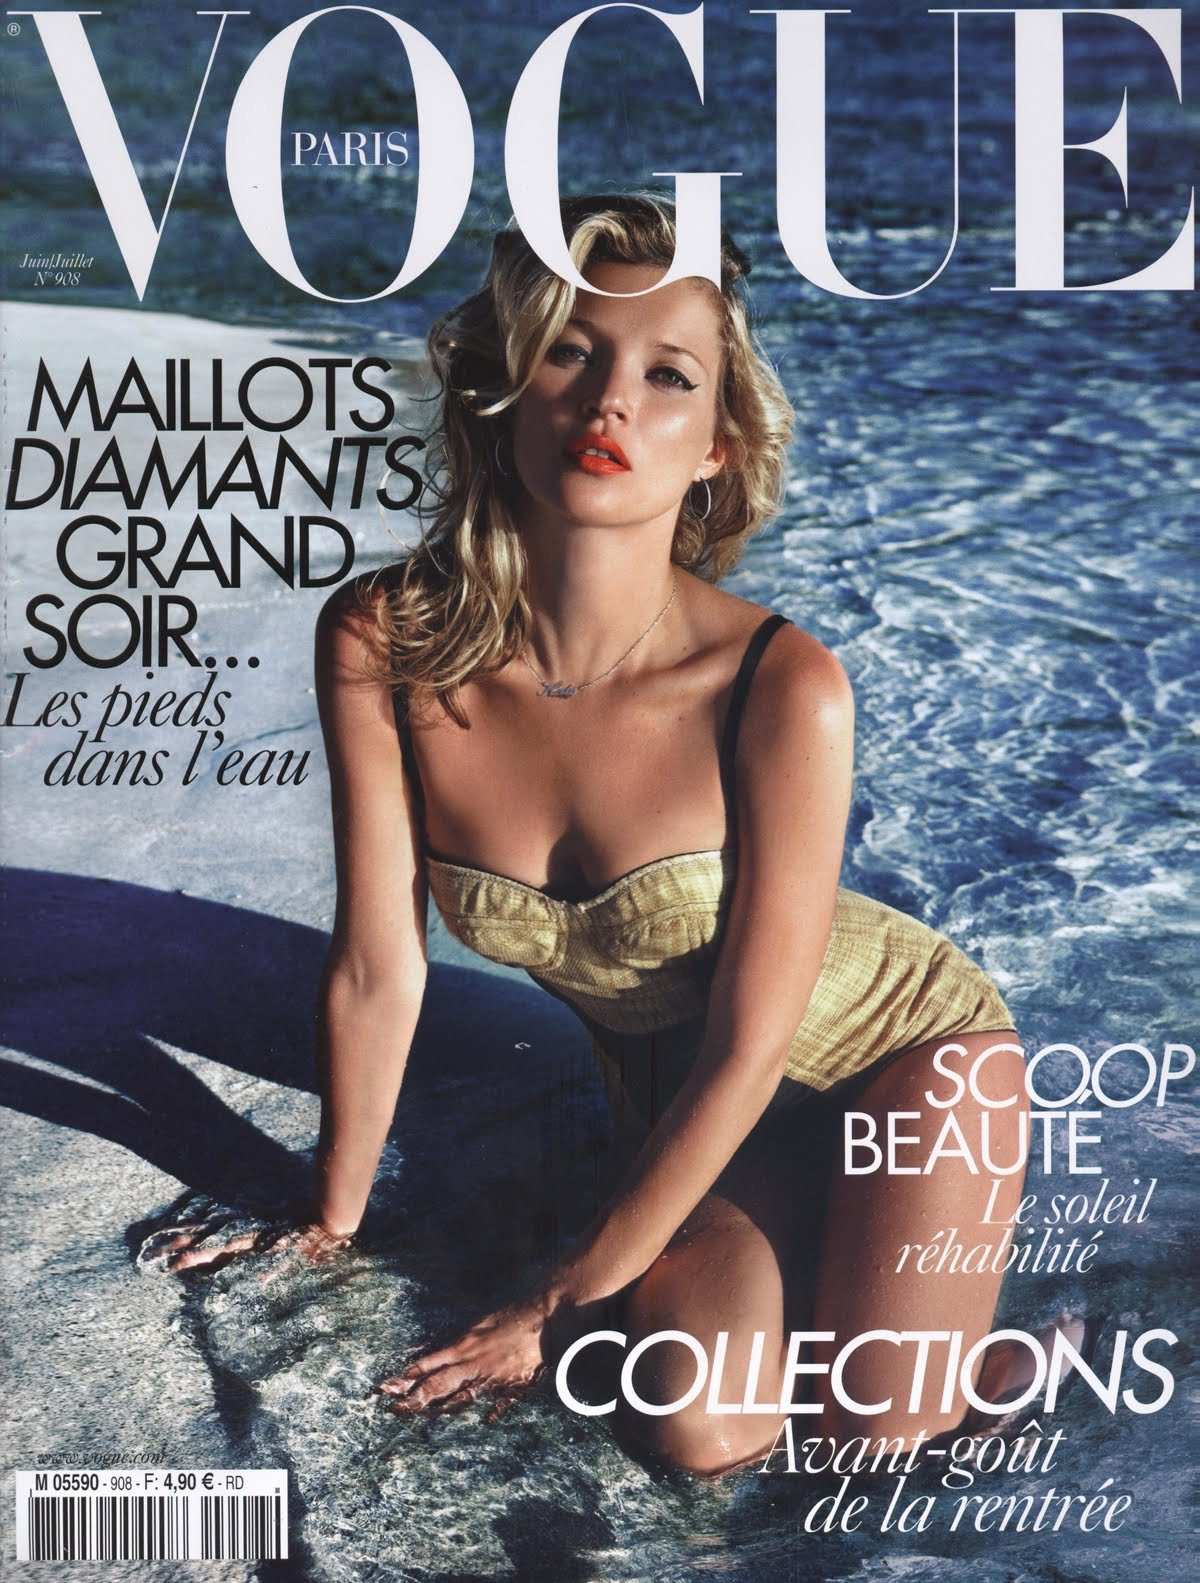 http://2.bp.blogspot.com/_FUYvMNTJrjU/TD-V0PIcA_I/AAAAAAAAE0c/-H2u8avSW3w/s1600/Kate+Moss+Vogue+Paris+JuneJuly.jpg